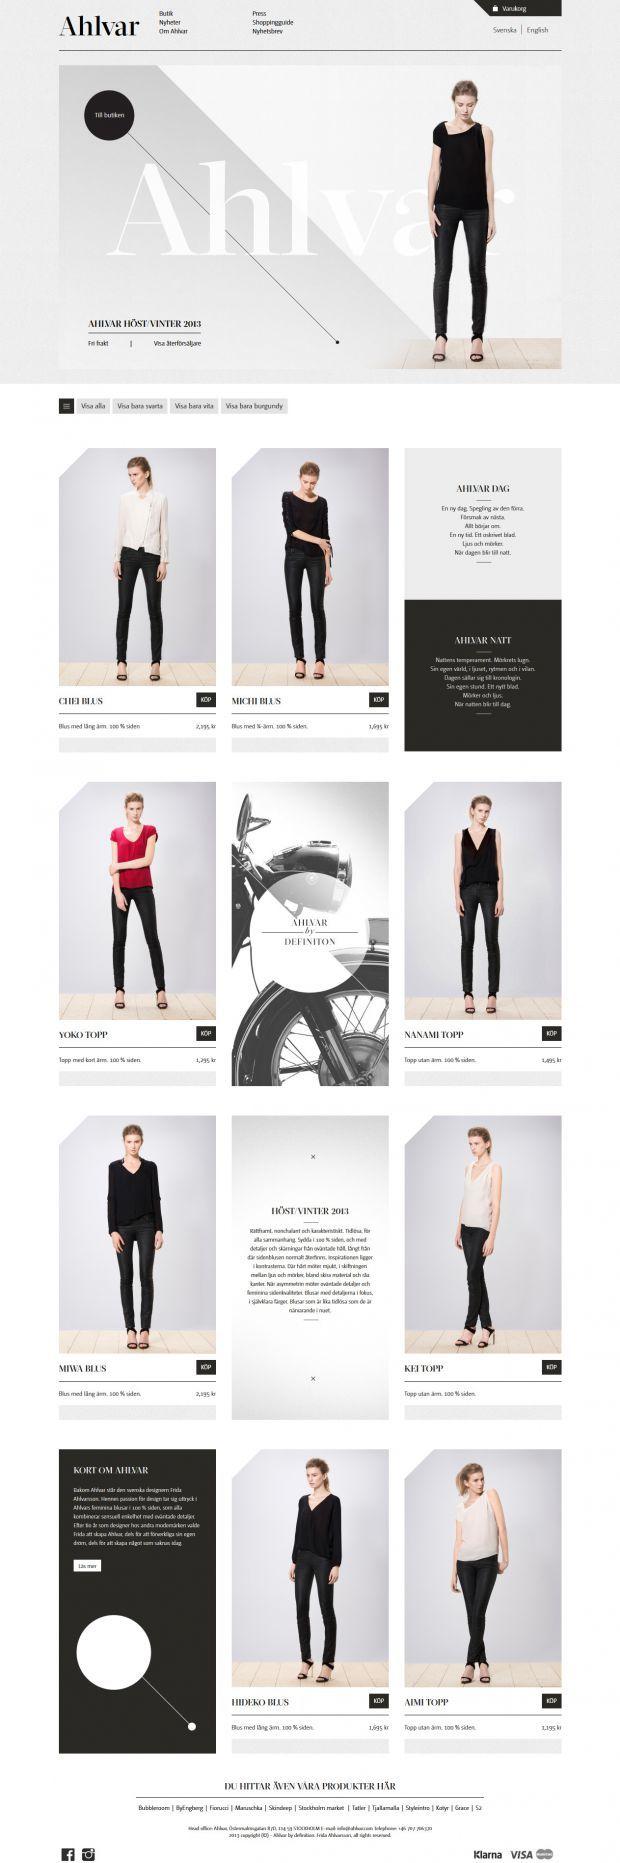 Blusar och toppar dag och natt - Ahlvar - Webdesign inspiration www.niceoneilike.com | #eCommerce #dynamic #responsive #webdesign #fixedheader